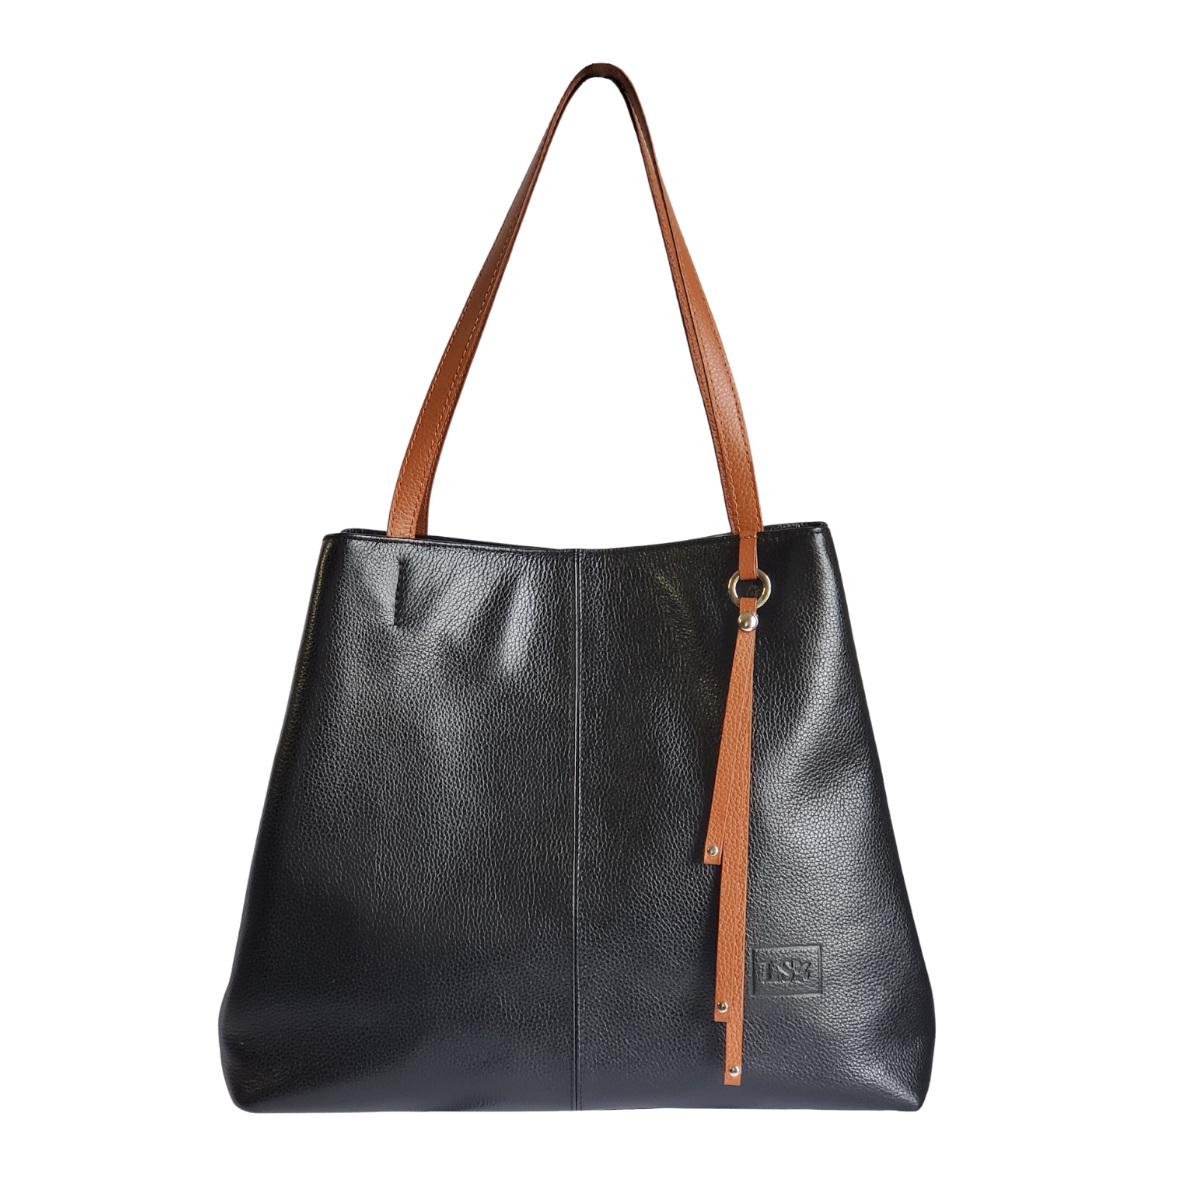 Sabrina Black Leather Handbag